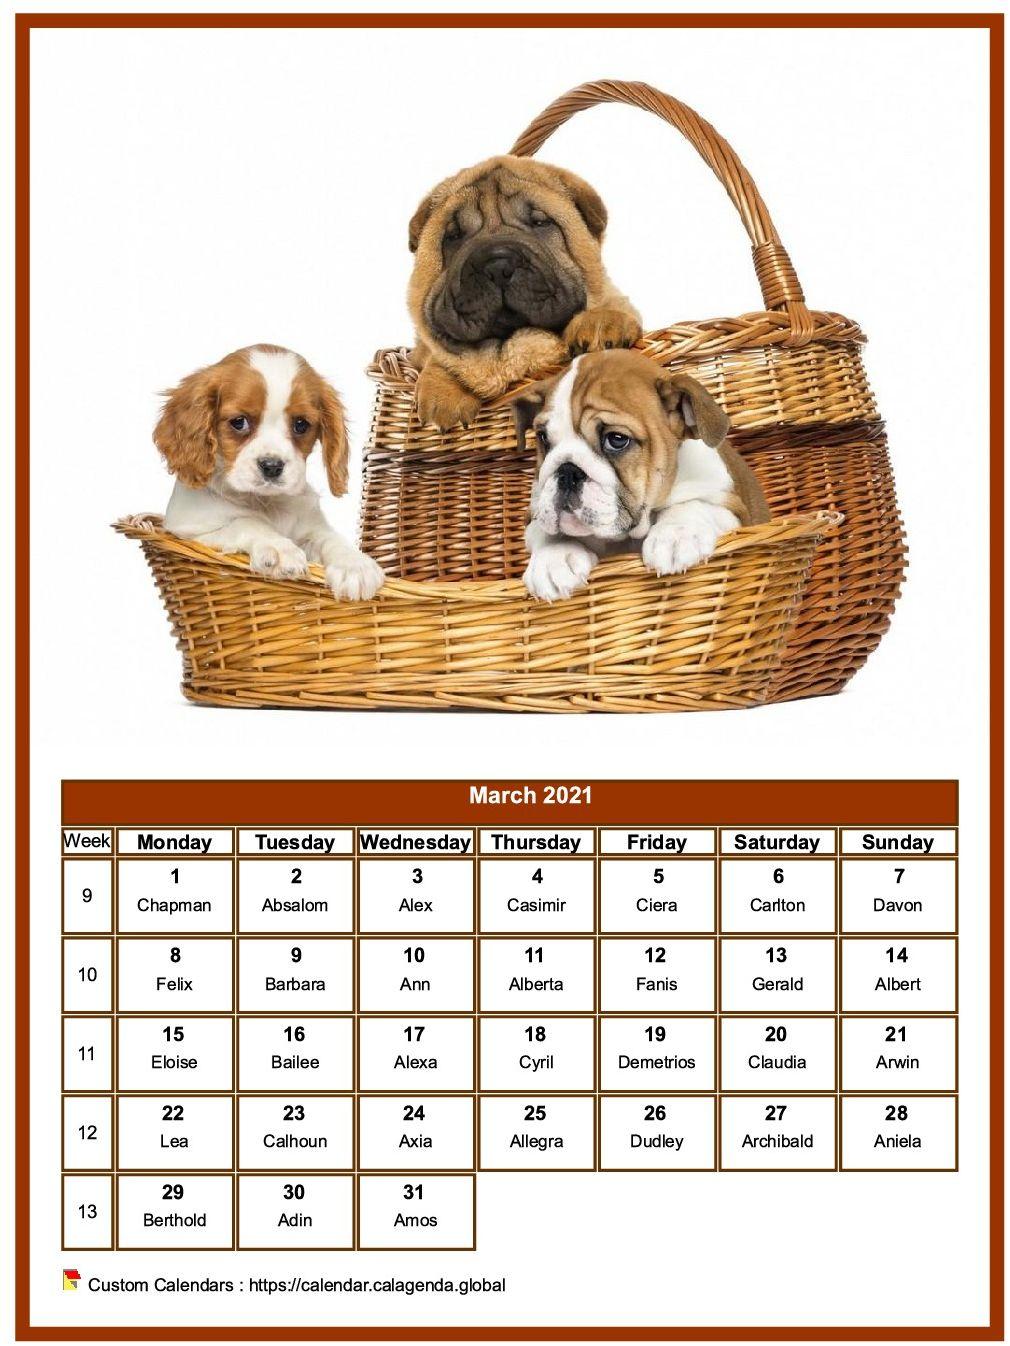 Calendar march 2021 dogs